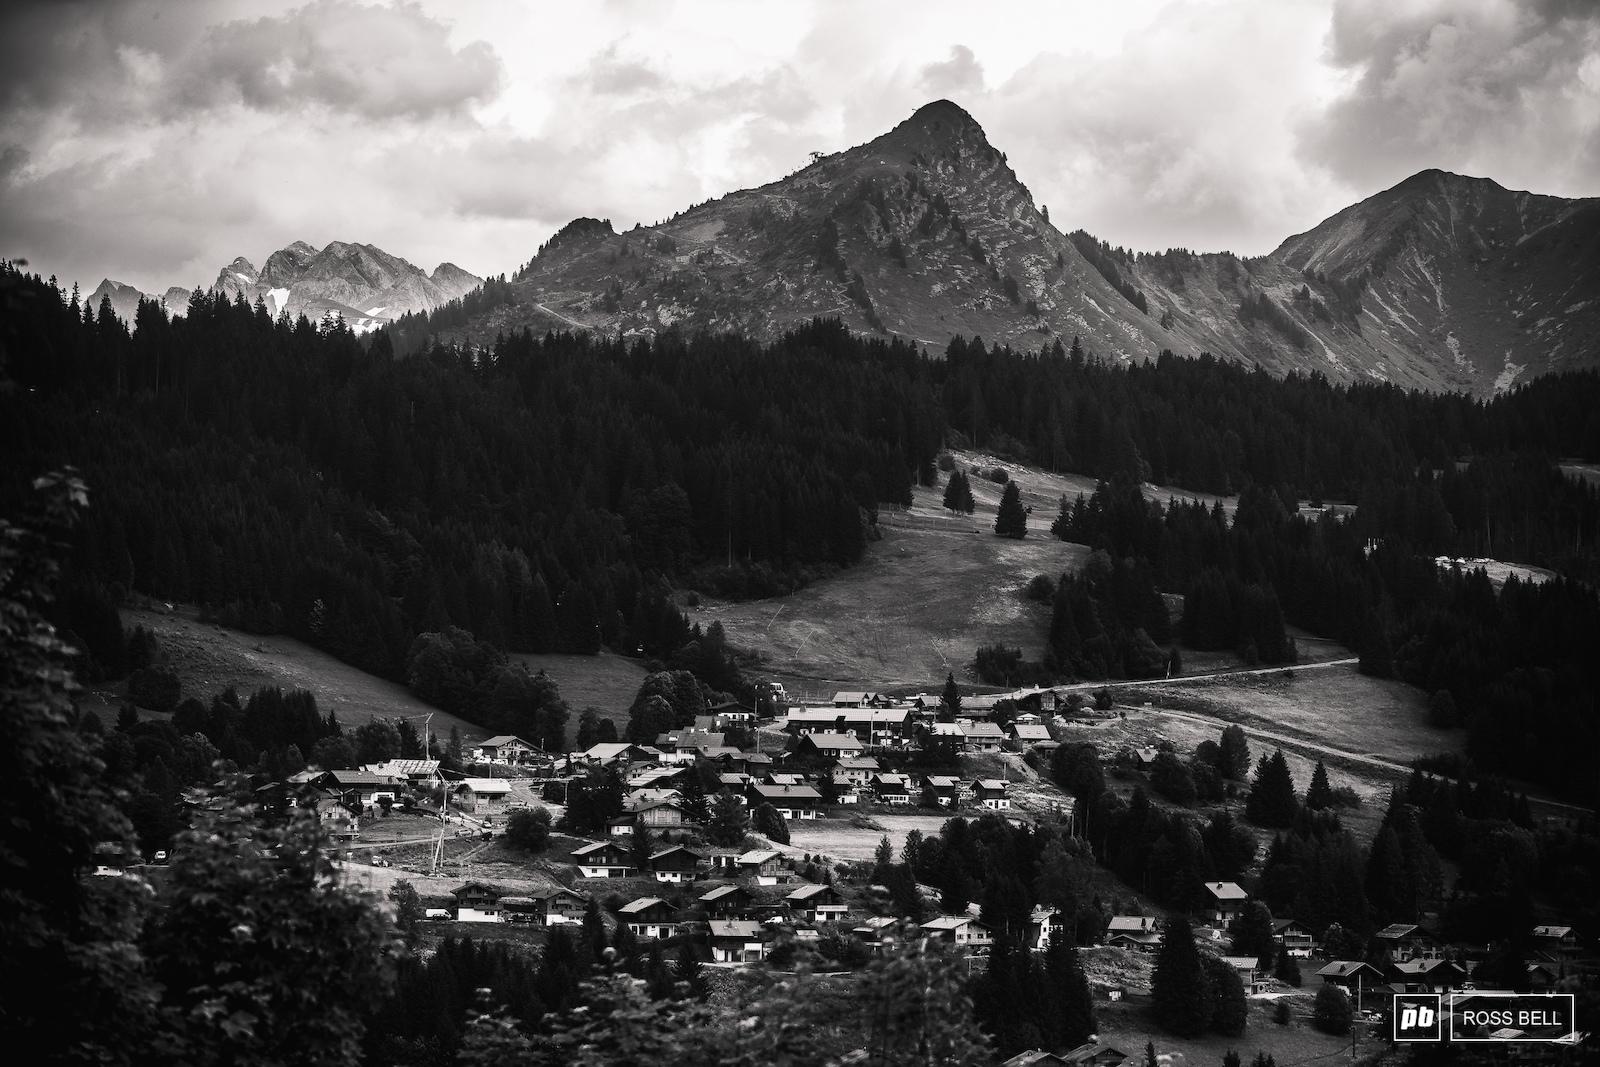 A quaint setting for a mountain bike race.